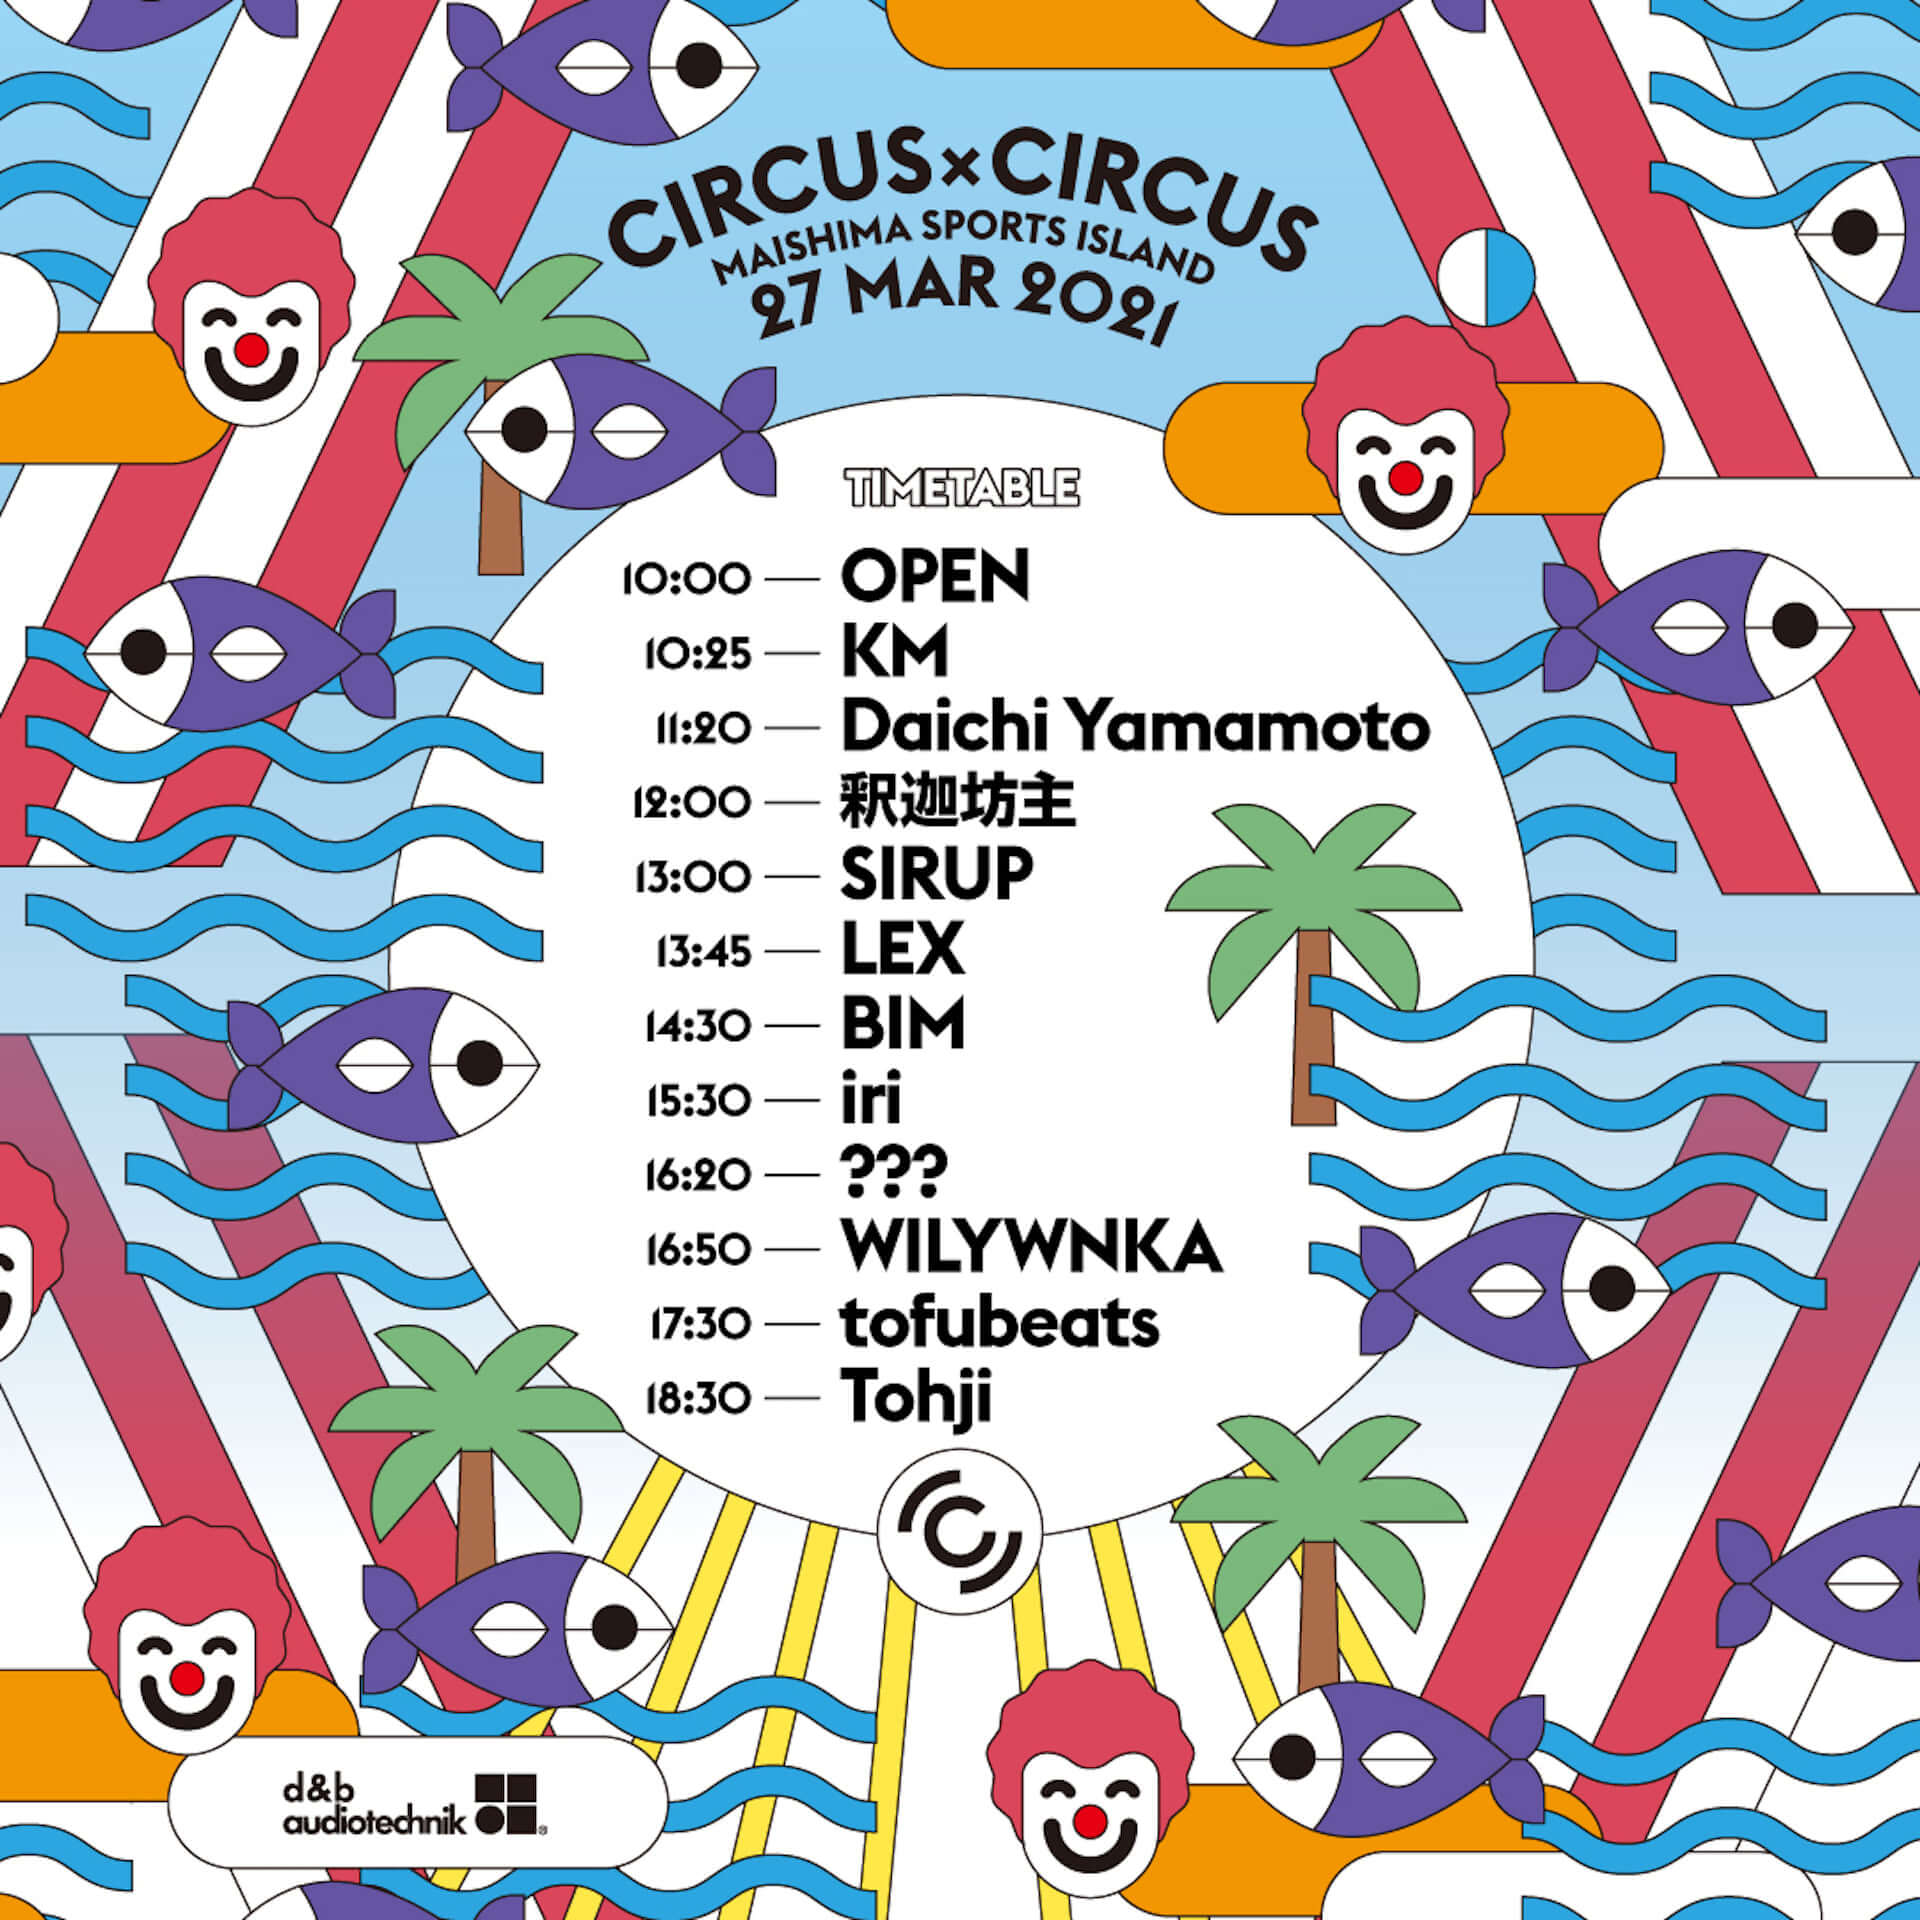 iri、tofubeats、Tohji、SIRUP、釈迦坊主らが出演する野外フェス<CIRCUS × CIRCUS>のタイムテーブルが発表! music210325_circusxcircus_1-1920x1920